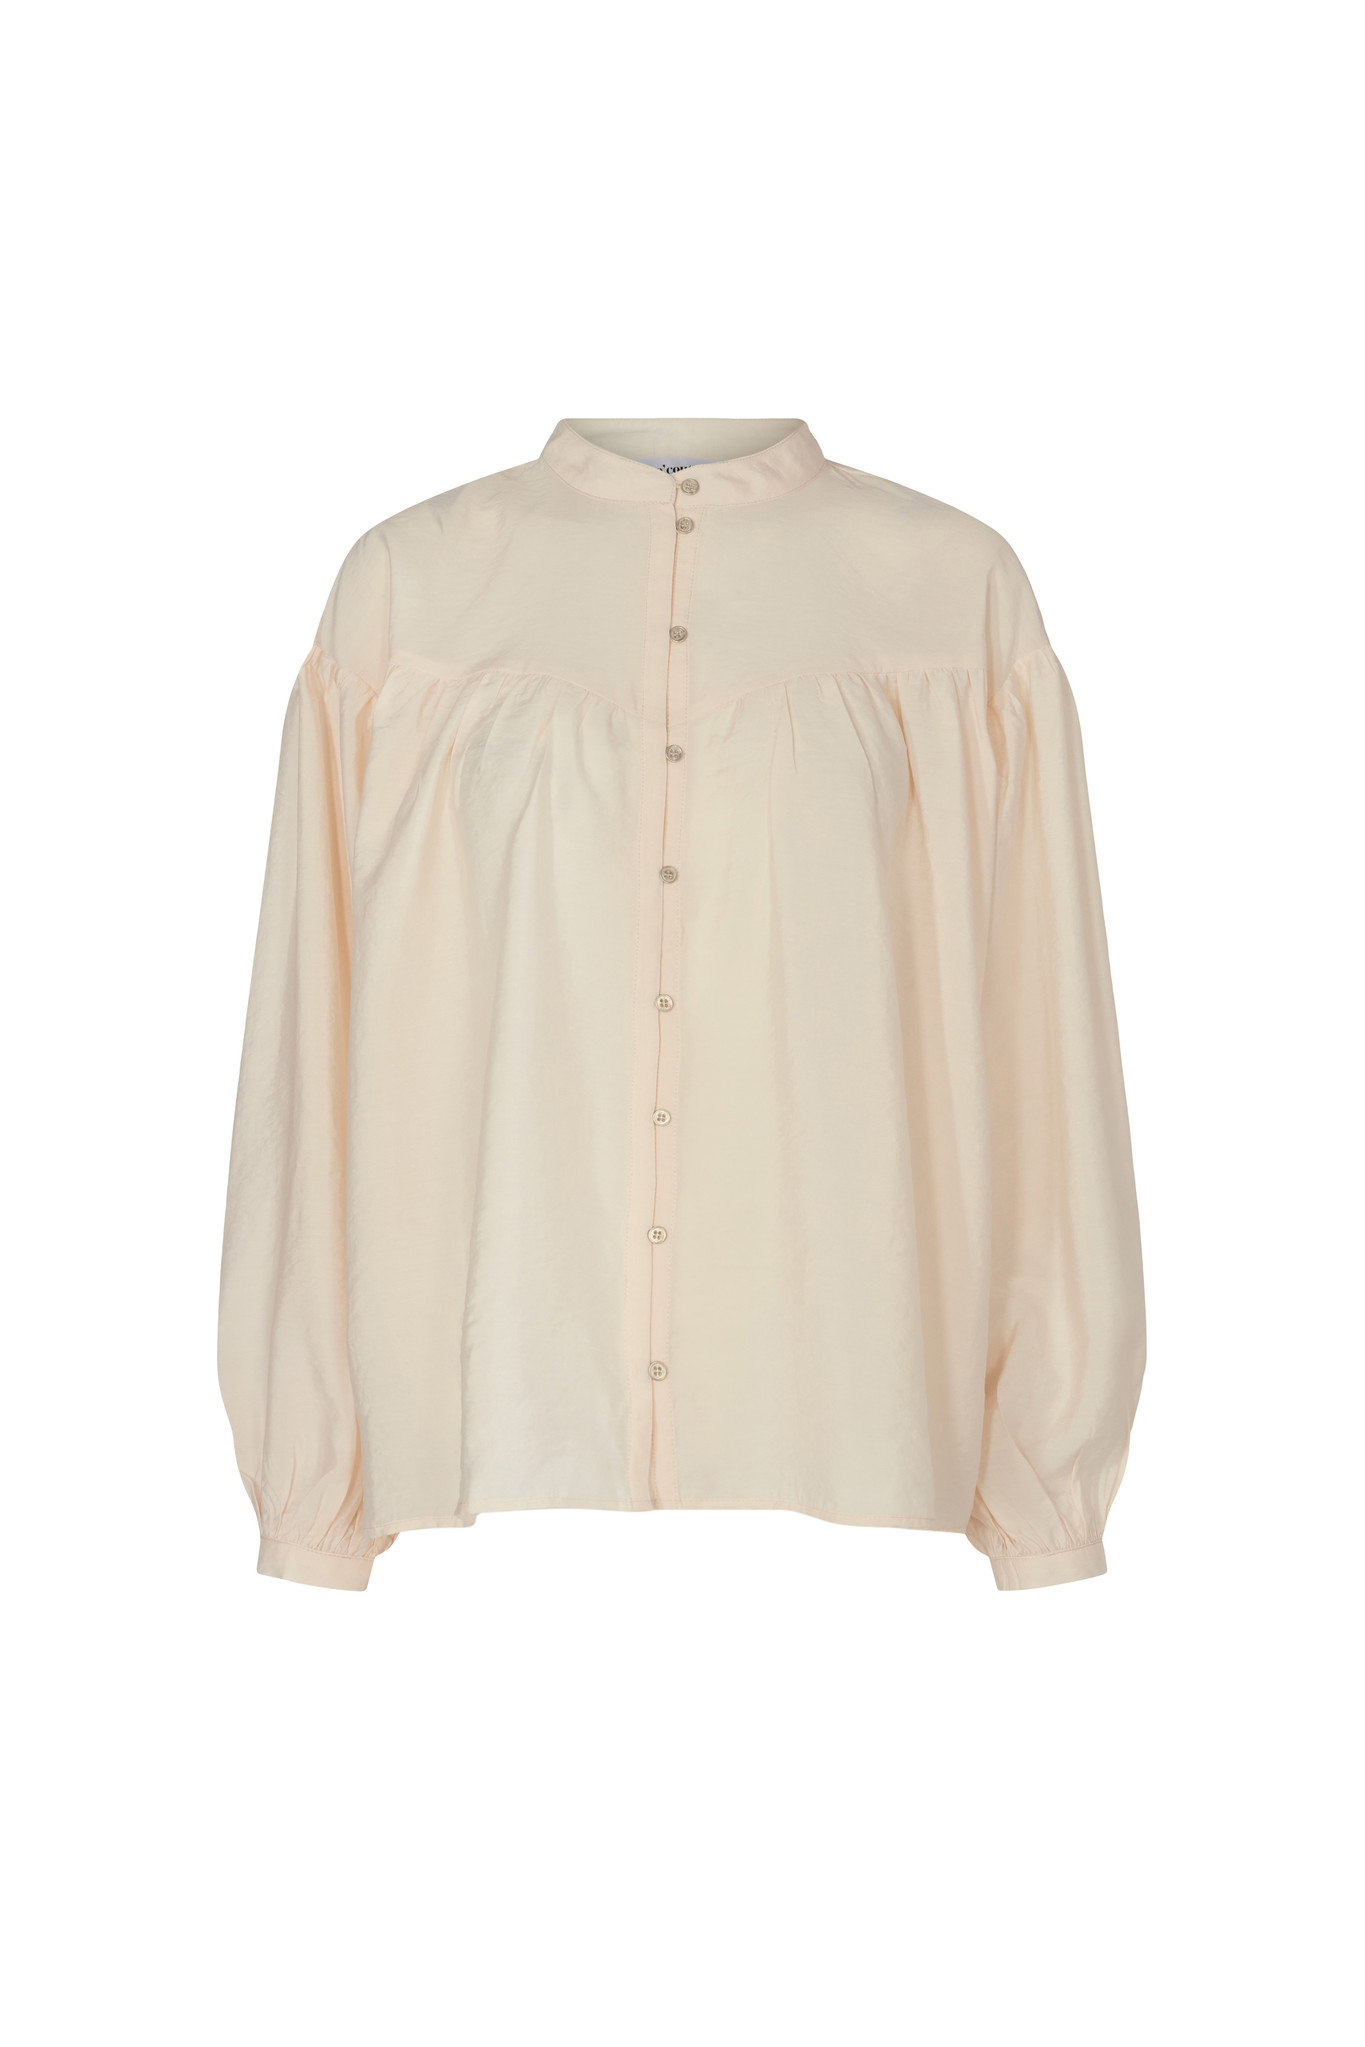 Callum Shirt - Powder-1